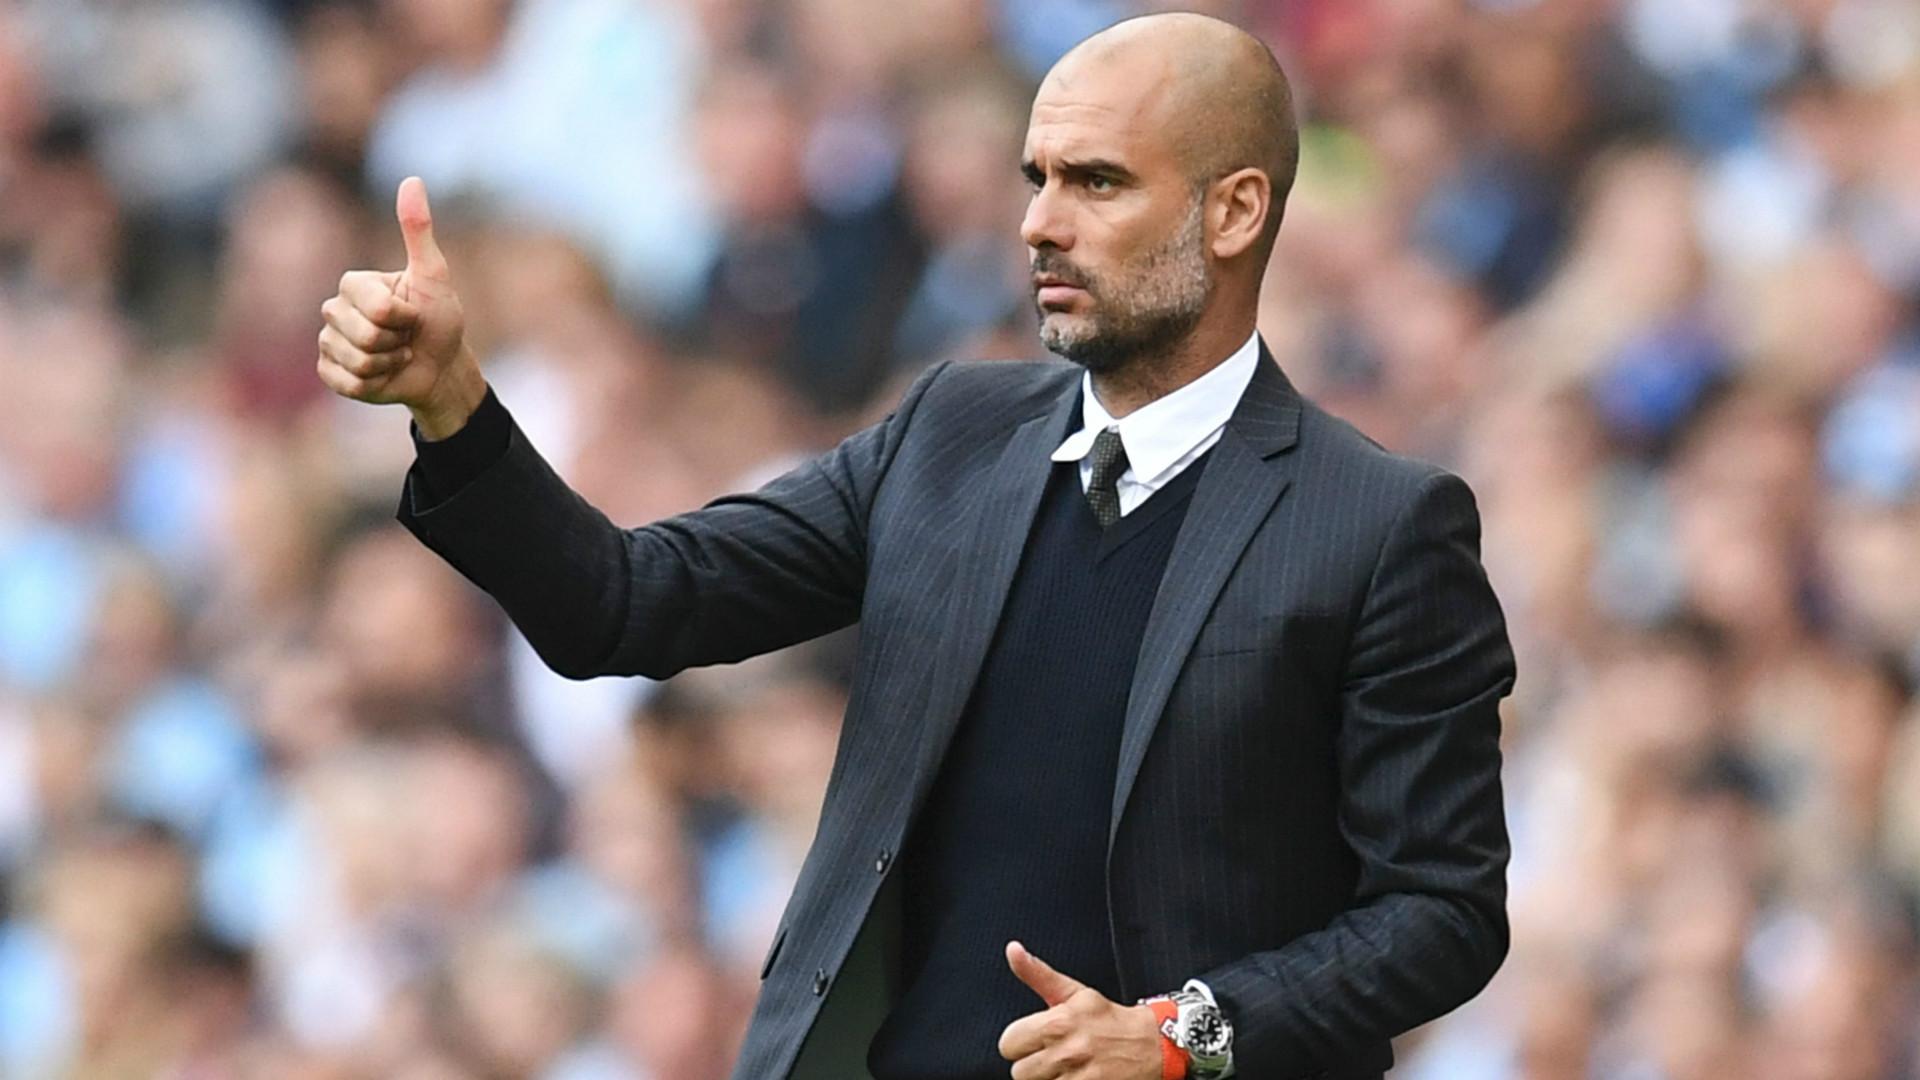 Гвардиола е рекордер во Премиер лигата  Ла Лига и Бундеслигата